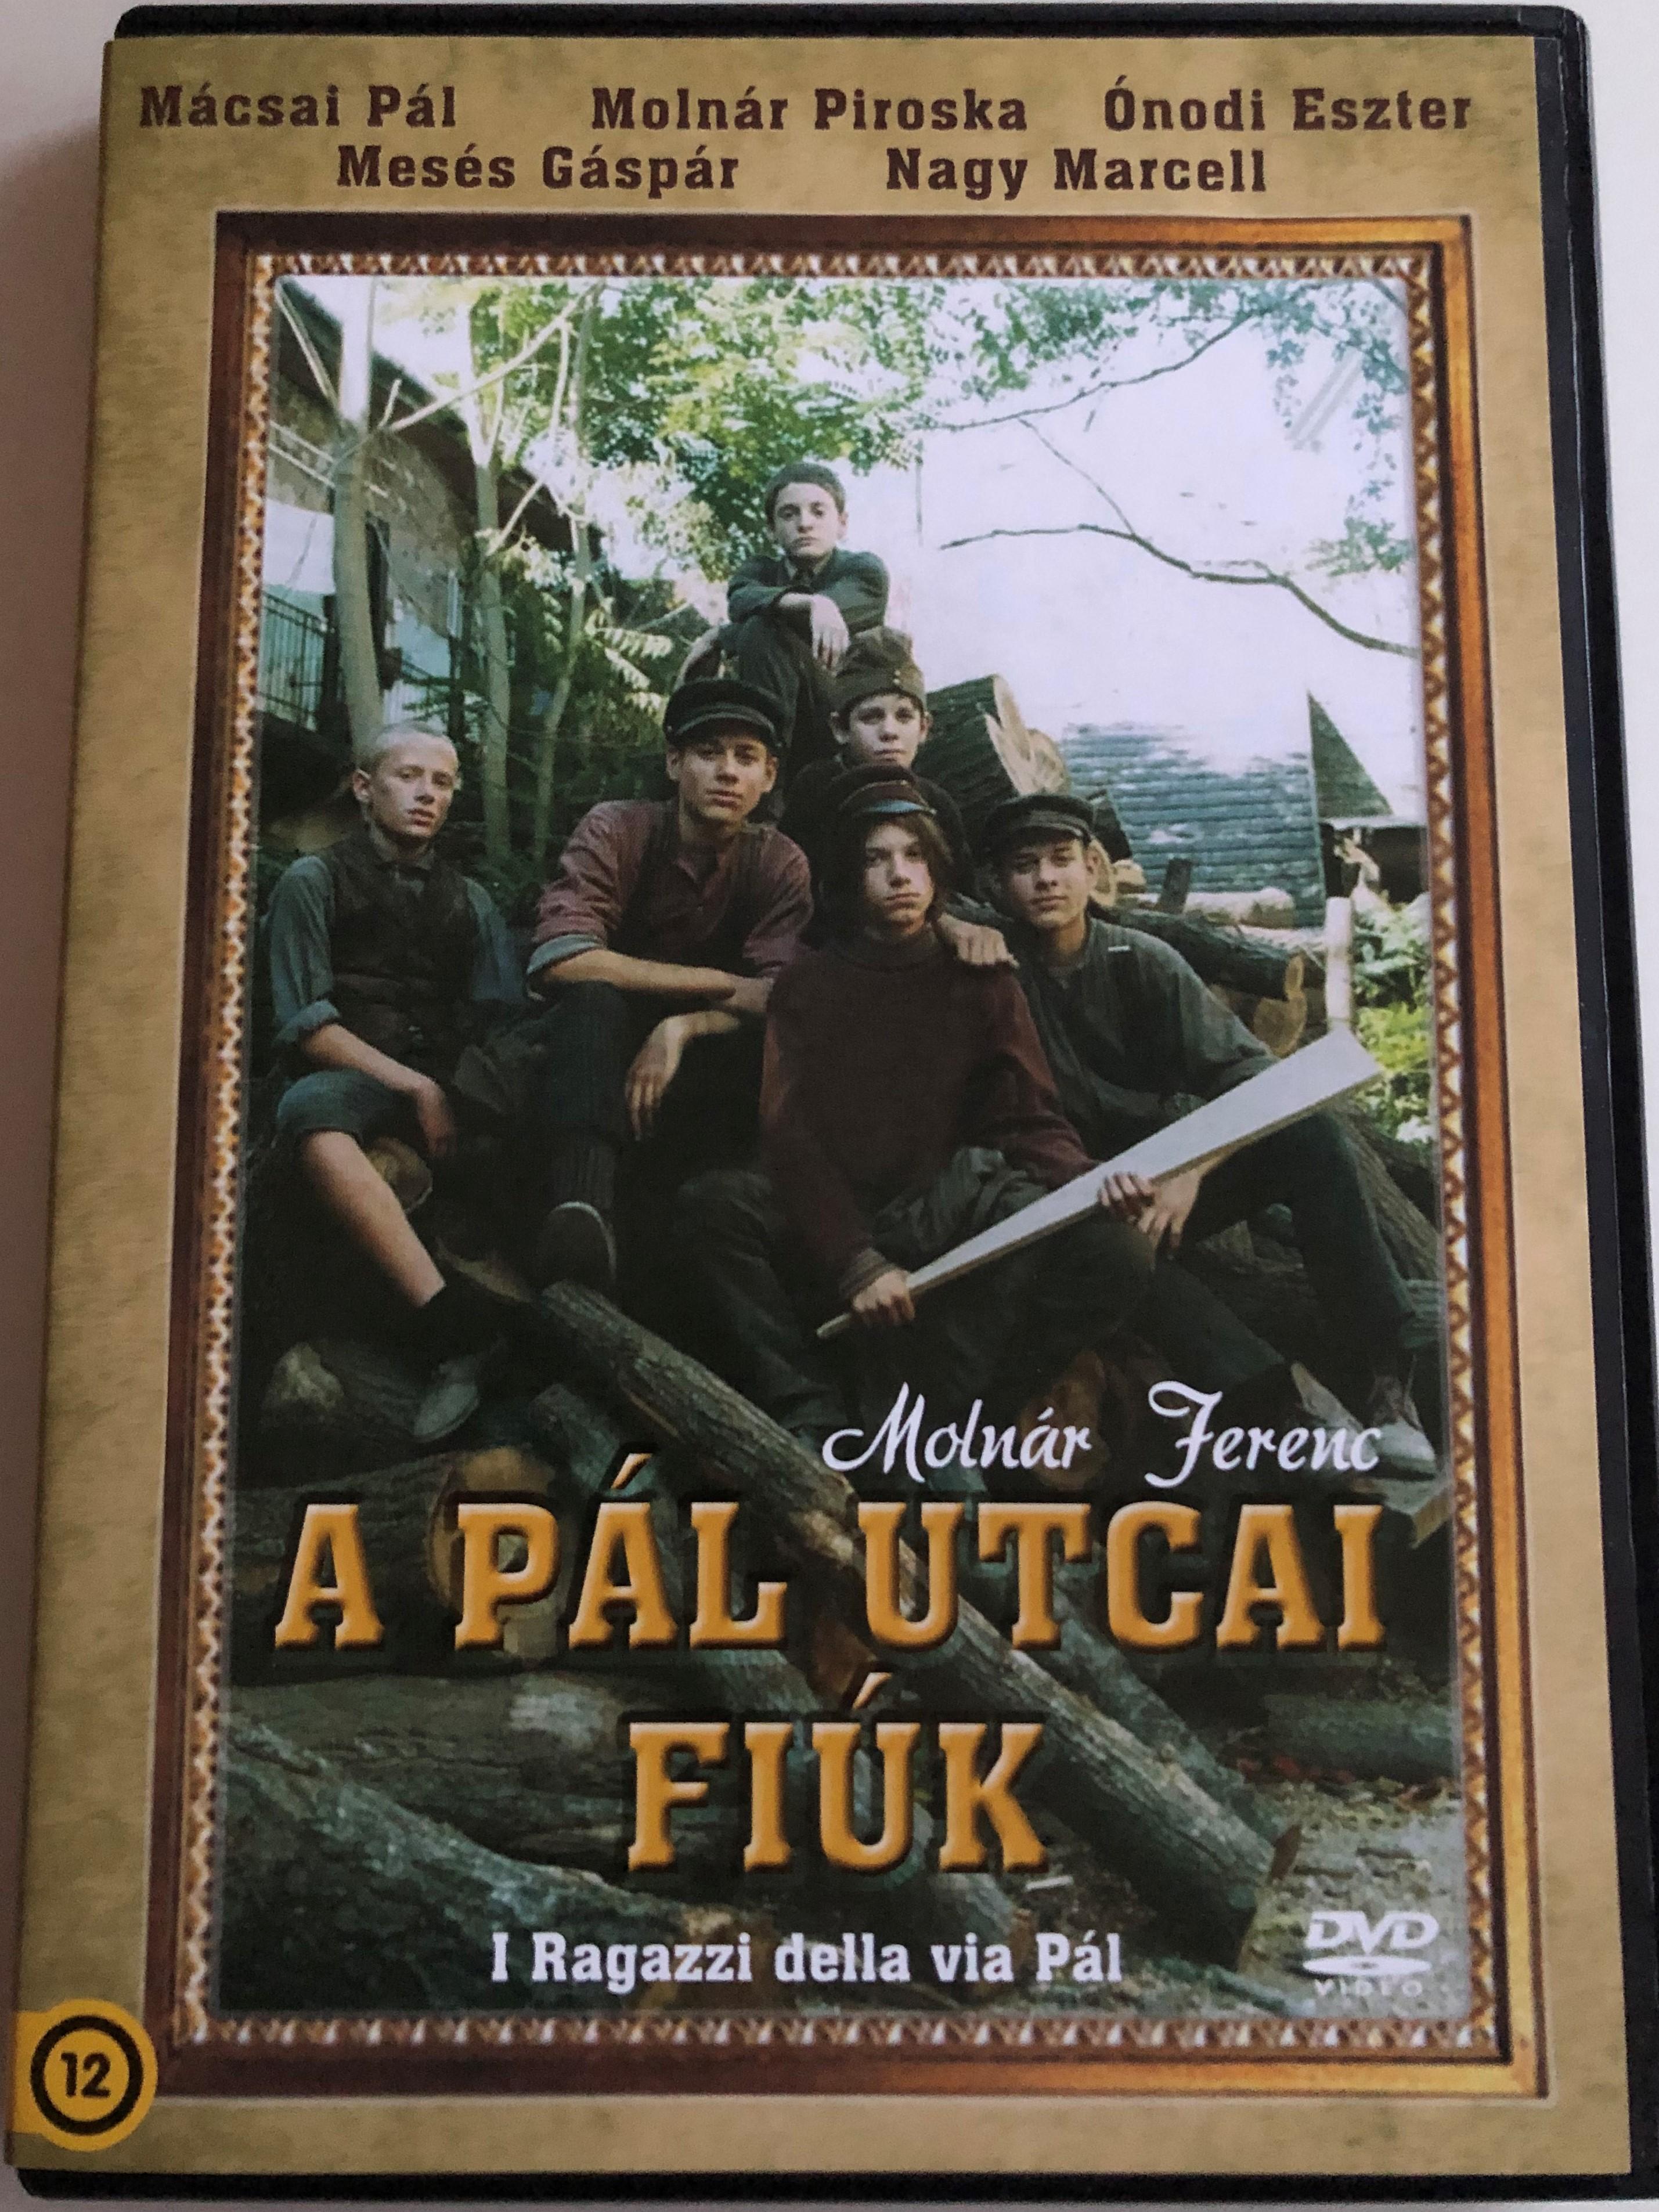 a-p-l-utcai-fi-k-dvd-2003-i-ragazzi-della-via-p-l-directed-by-maurizio-zaccaro-1.jpg